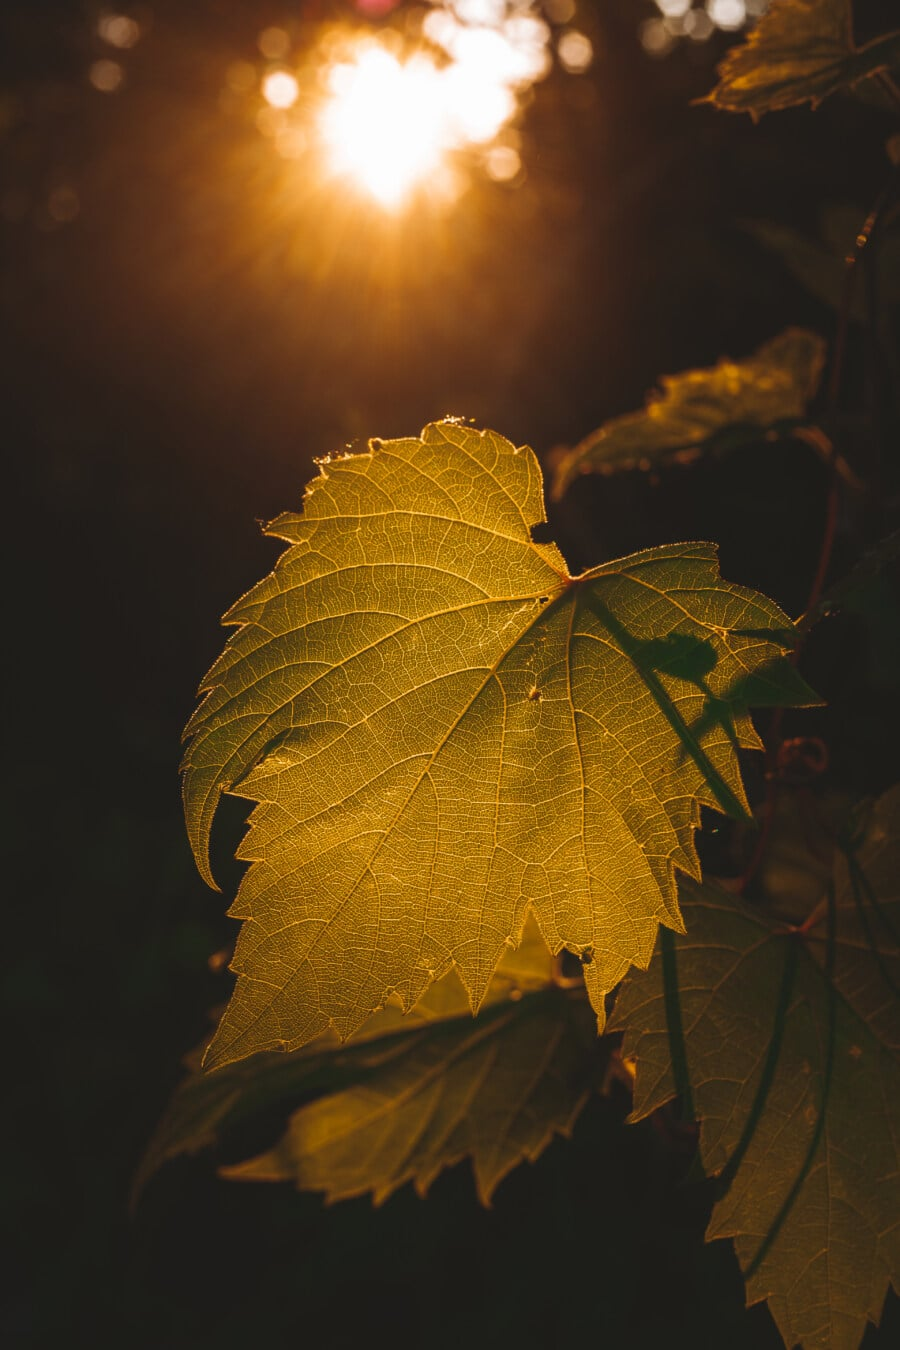 leaf, yellow green, sunlight, sunrays, backlight, close-up, silhouette, darkness, sun, nature